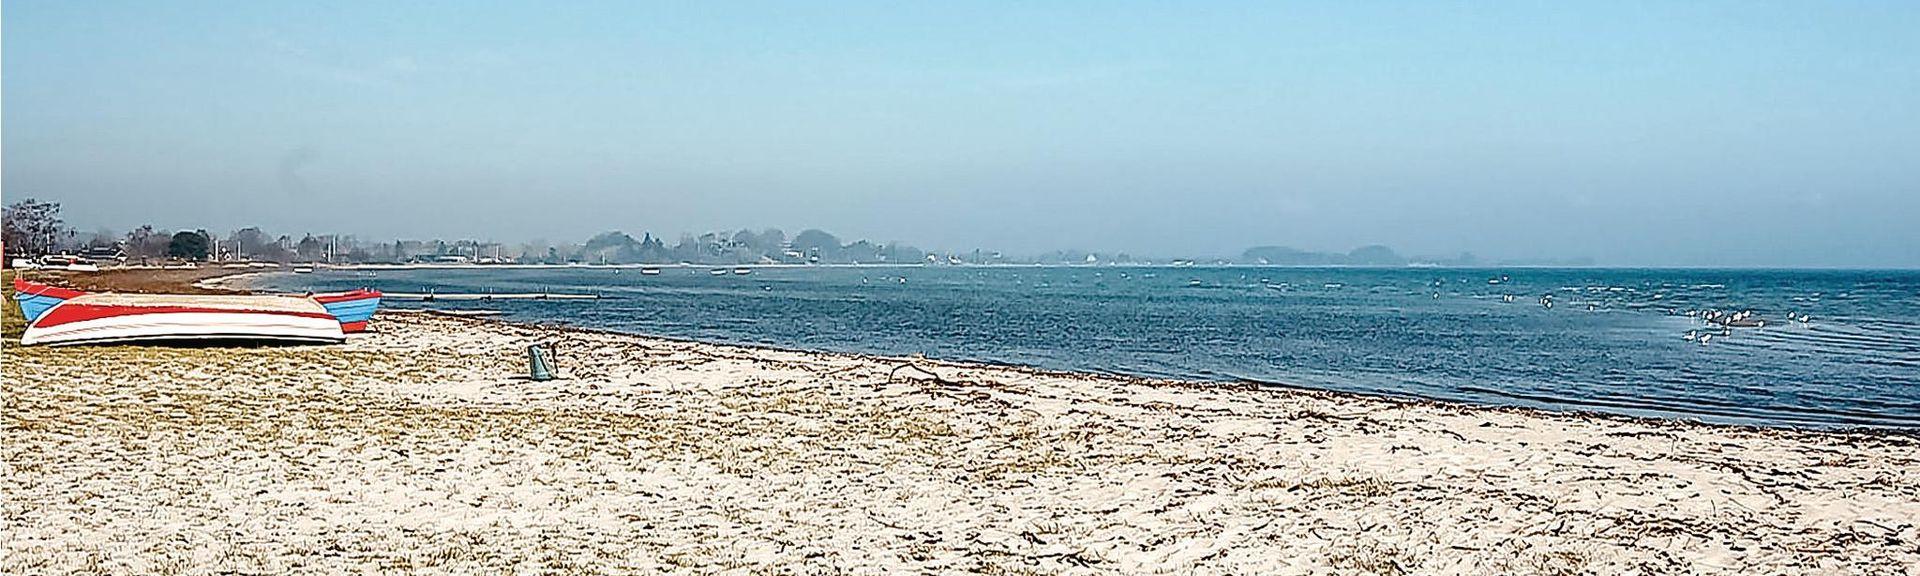 Grønninghoved Strand, Sjølund, Region Syddanmark, Danmark